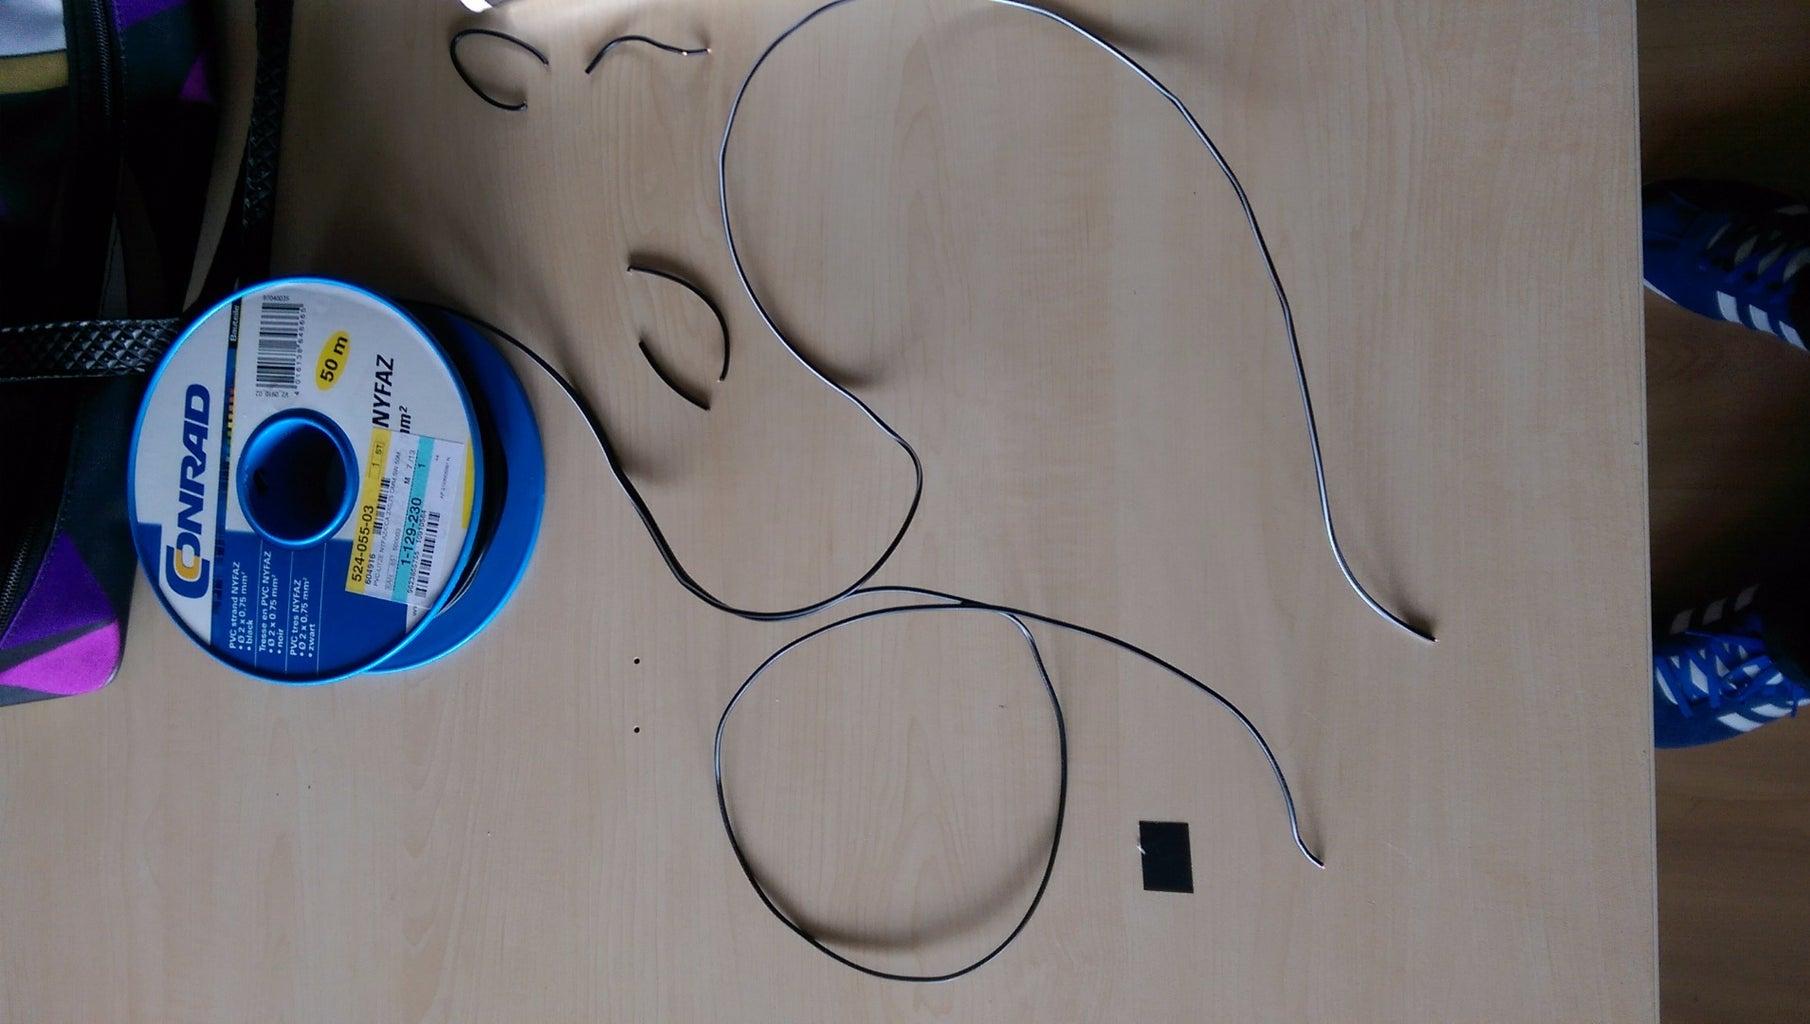 Preparing Wires for Finger Touch Senses